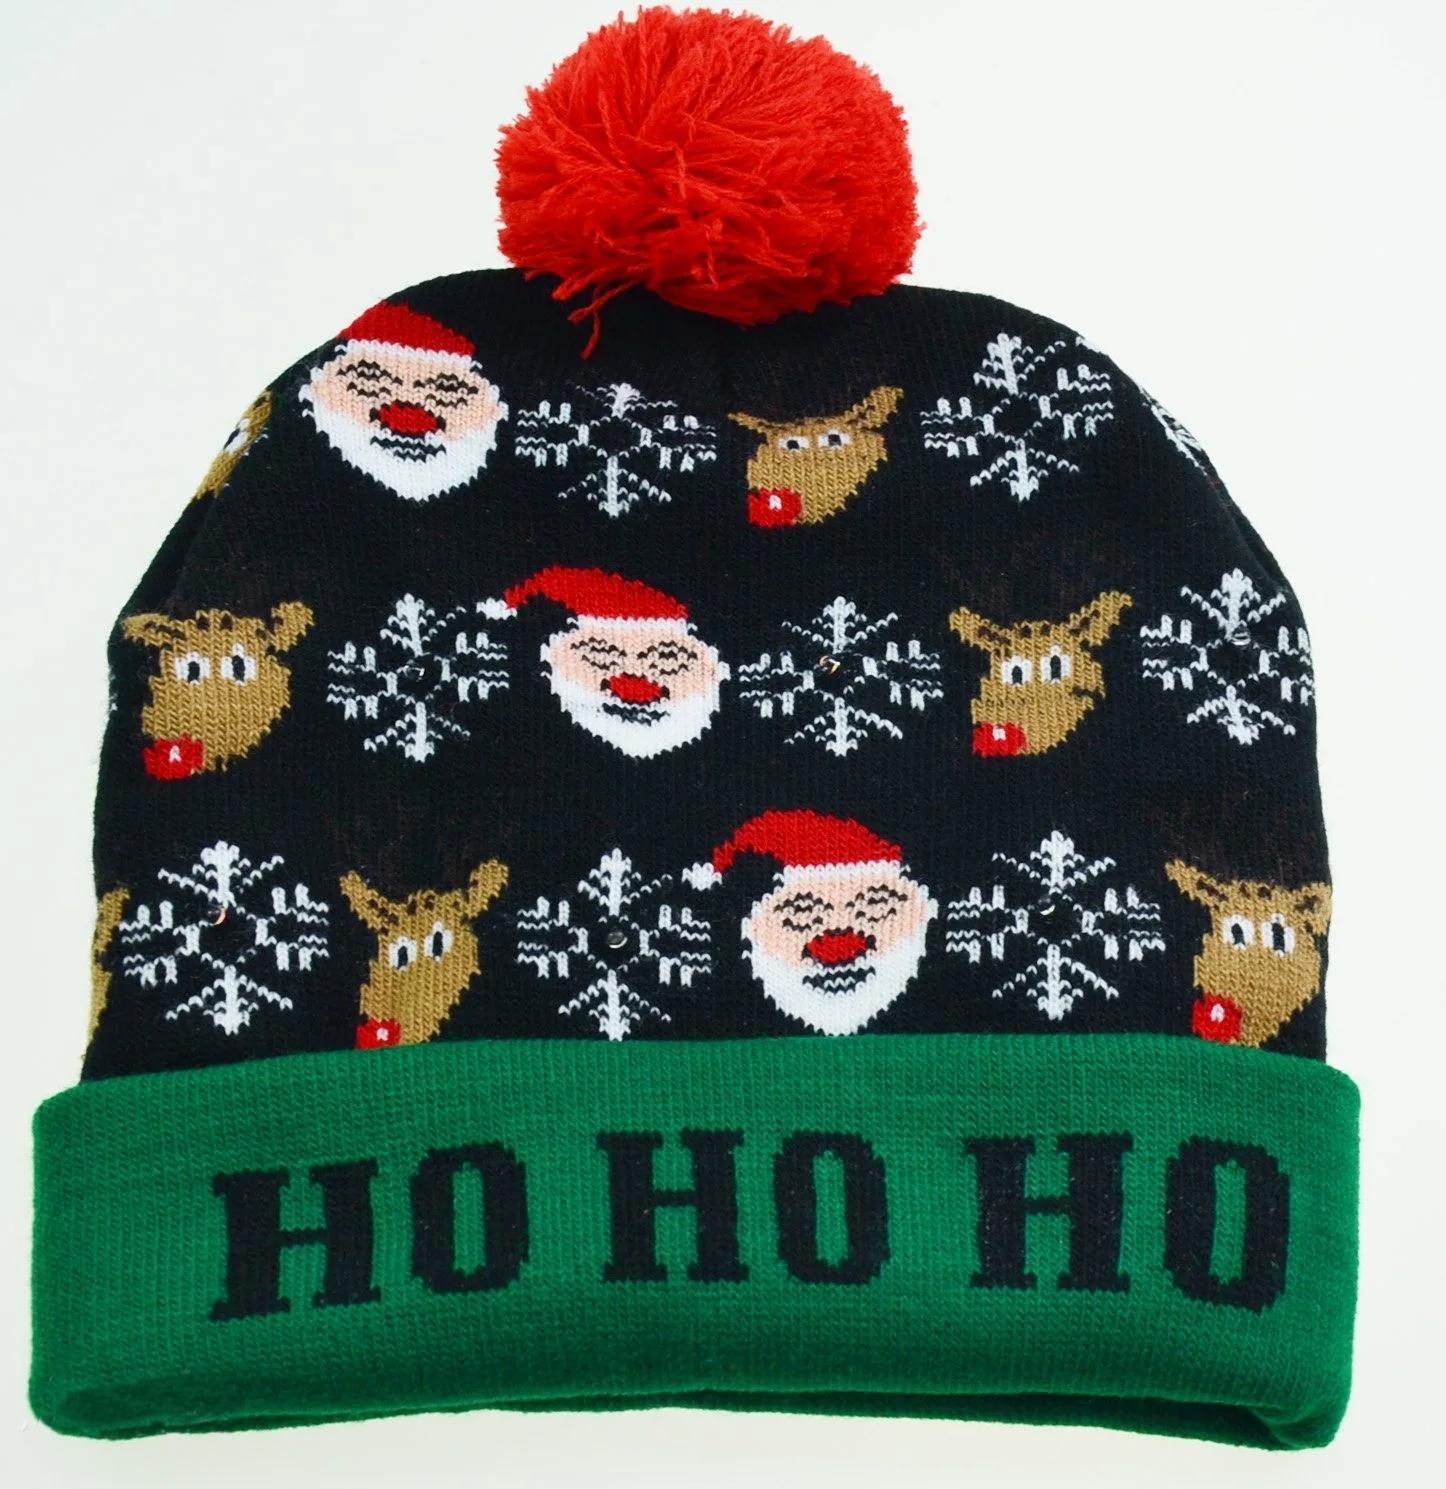 Holiday Custom Led Knitted Hat/ Led Beanie Hat/ Led Winter Gorros Hat 3